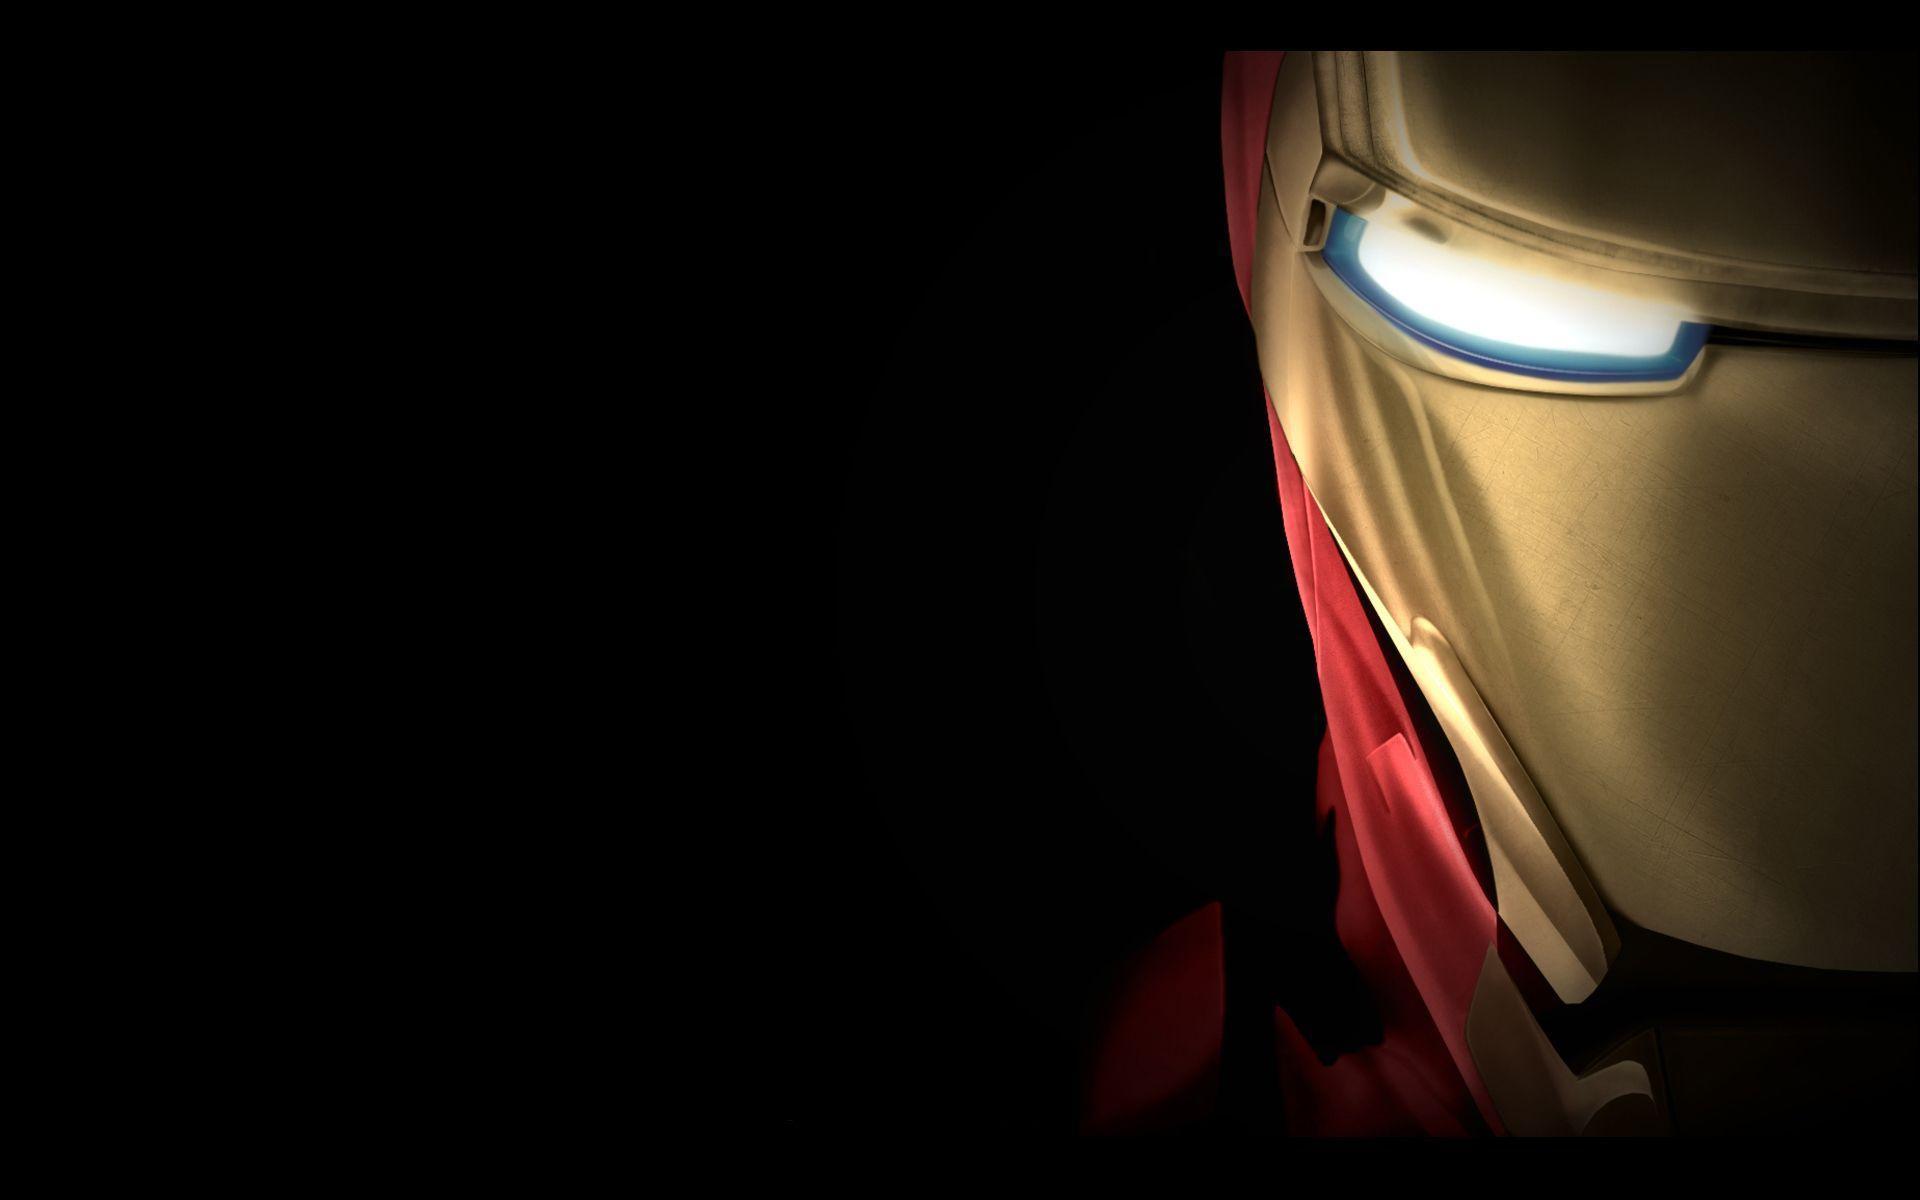 Iron Man Face Wallpapers Top Free Iron Man Face Backgrounds Wallpaperaccess